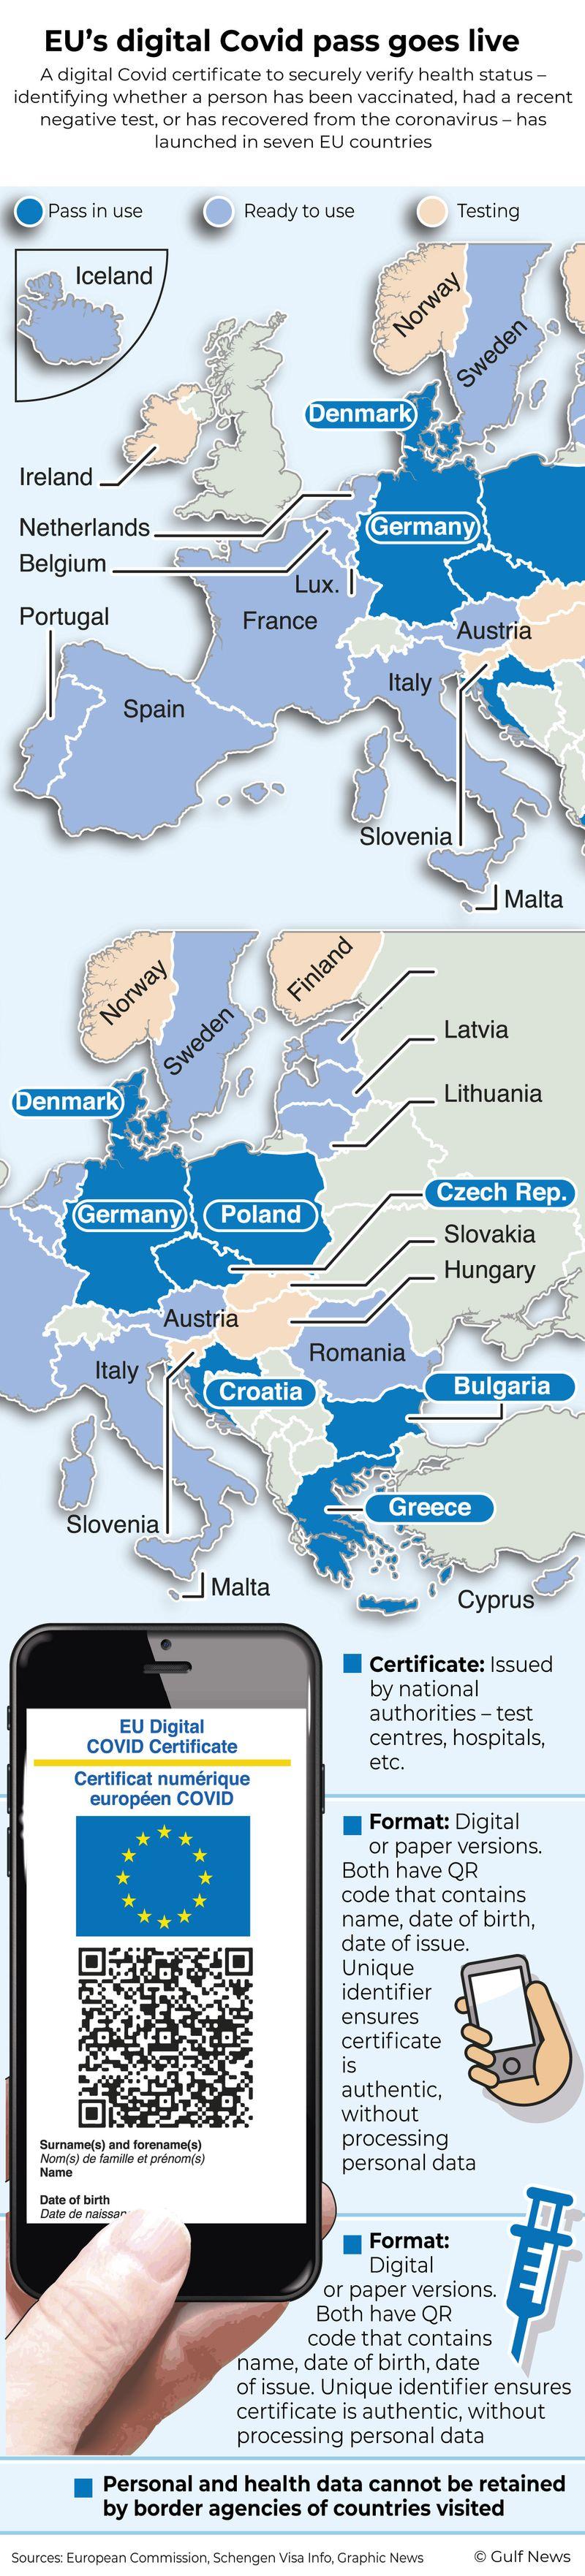 Infographic: EU's digital Covid pass goes live